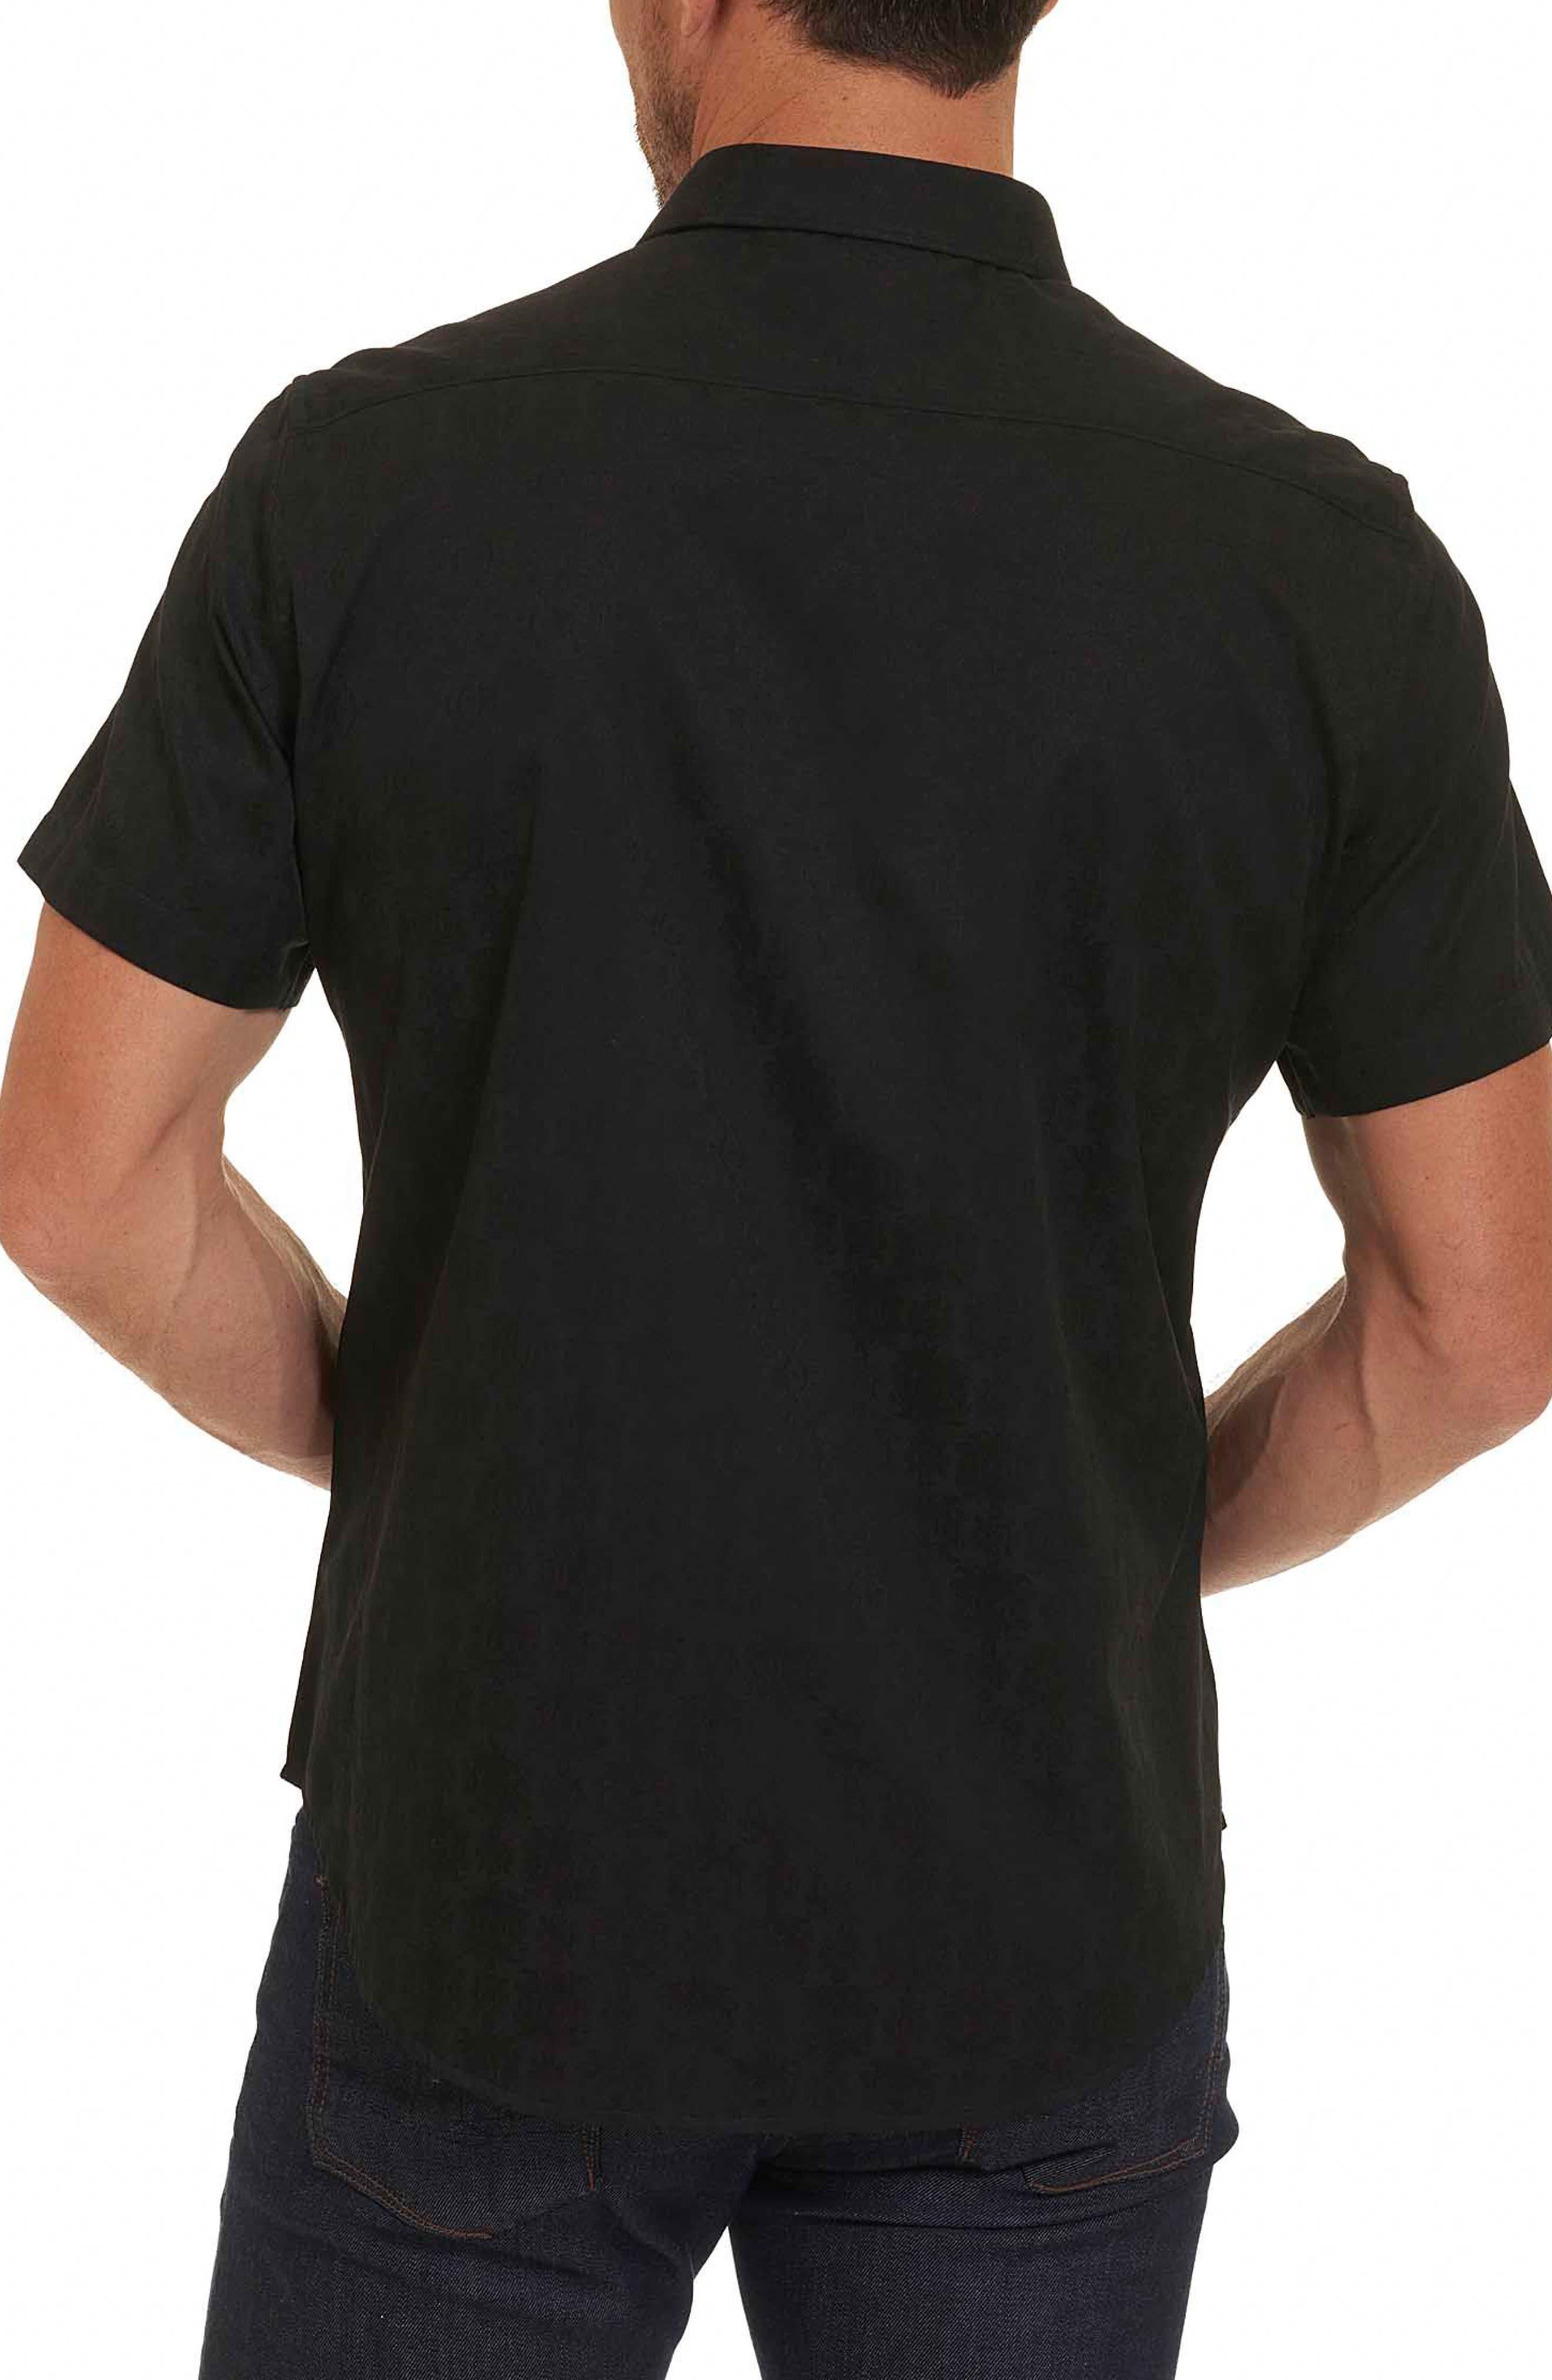 Cullen Regular Fit Sport Shirt,                             Alternate thumbnail 8, color,